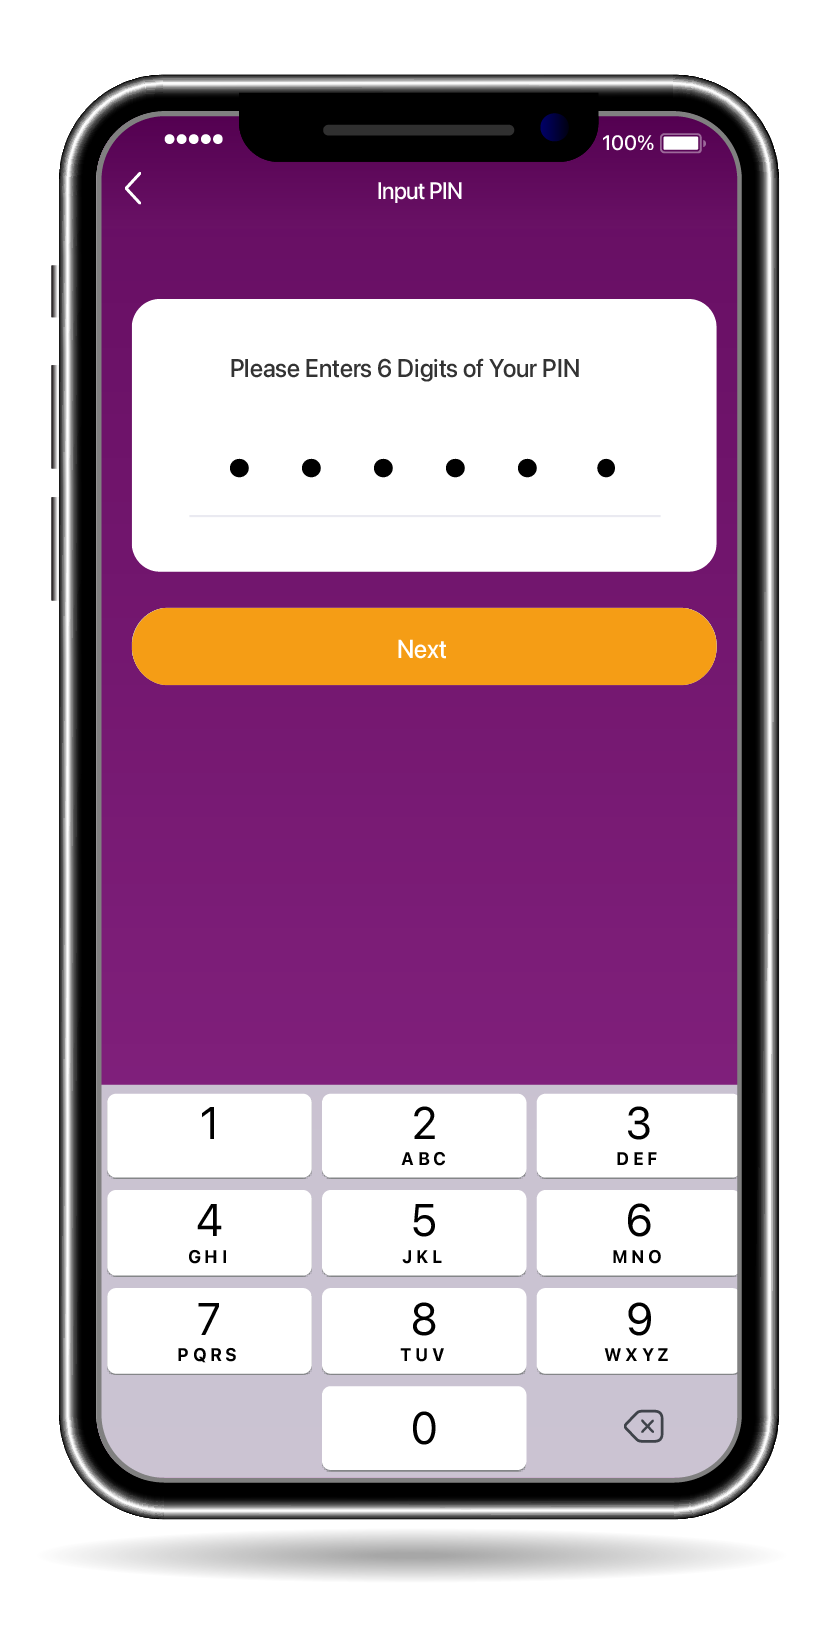 Input PIN/Use Fingerprint